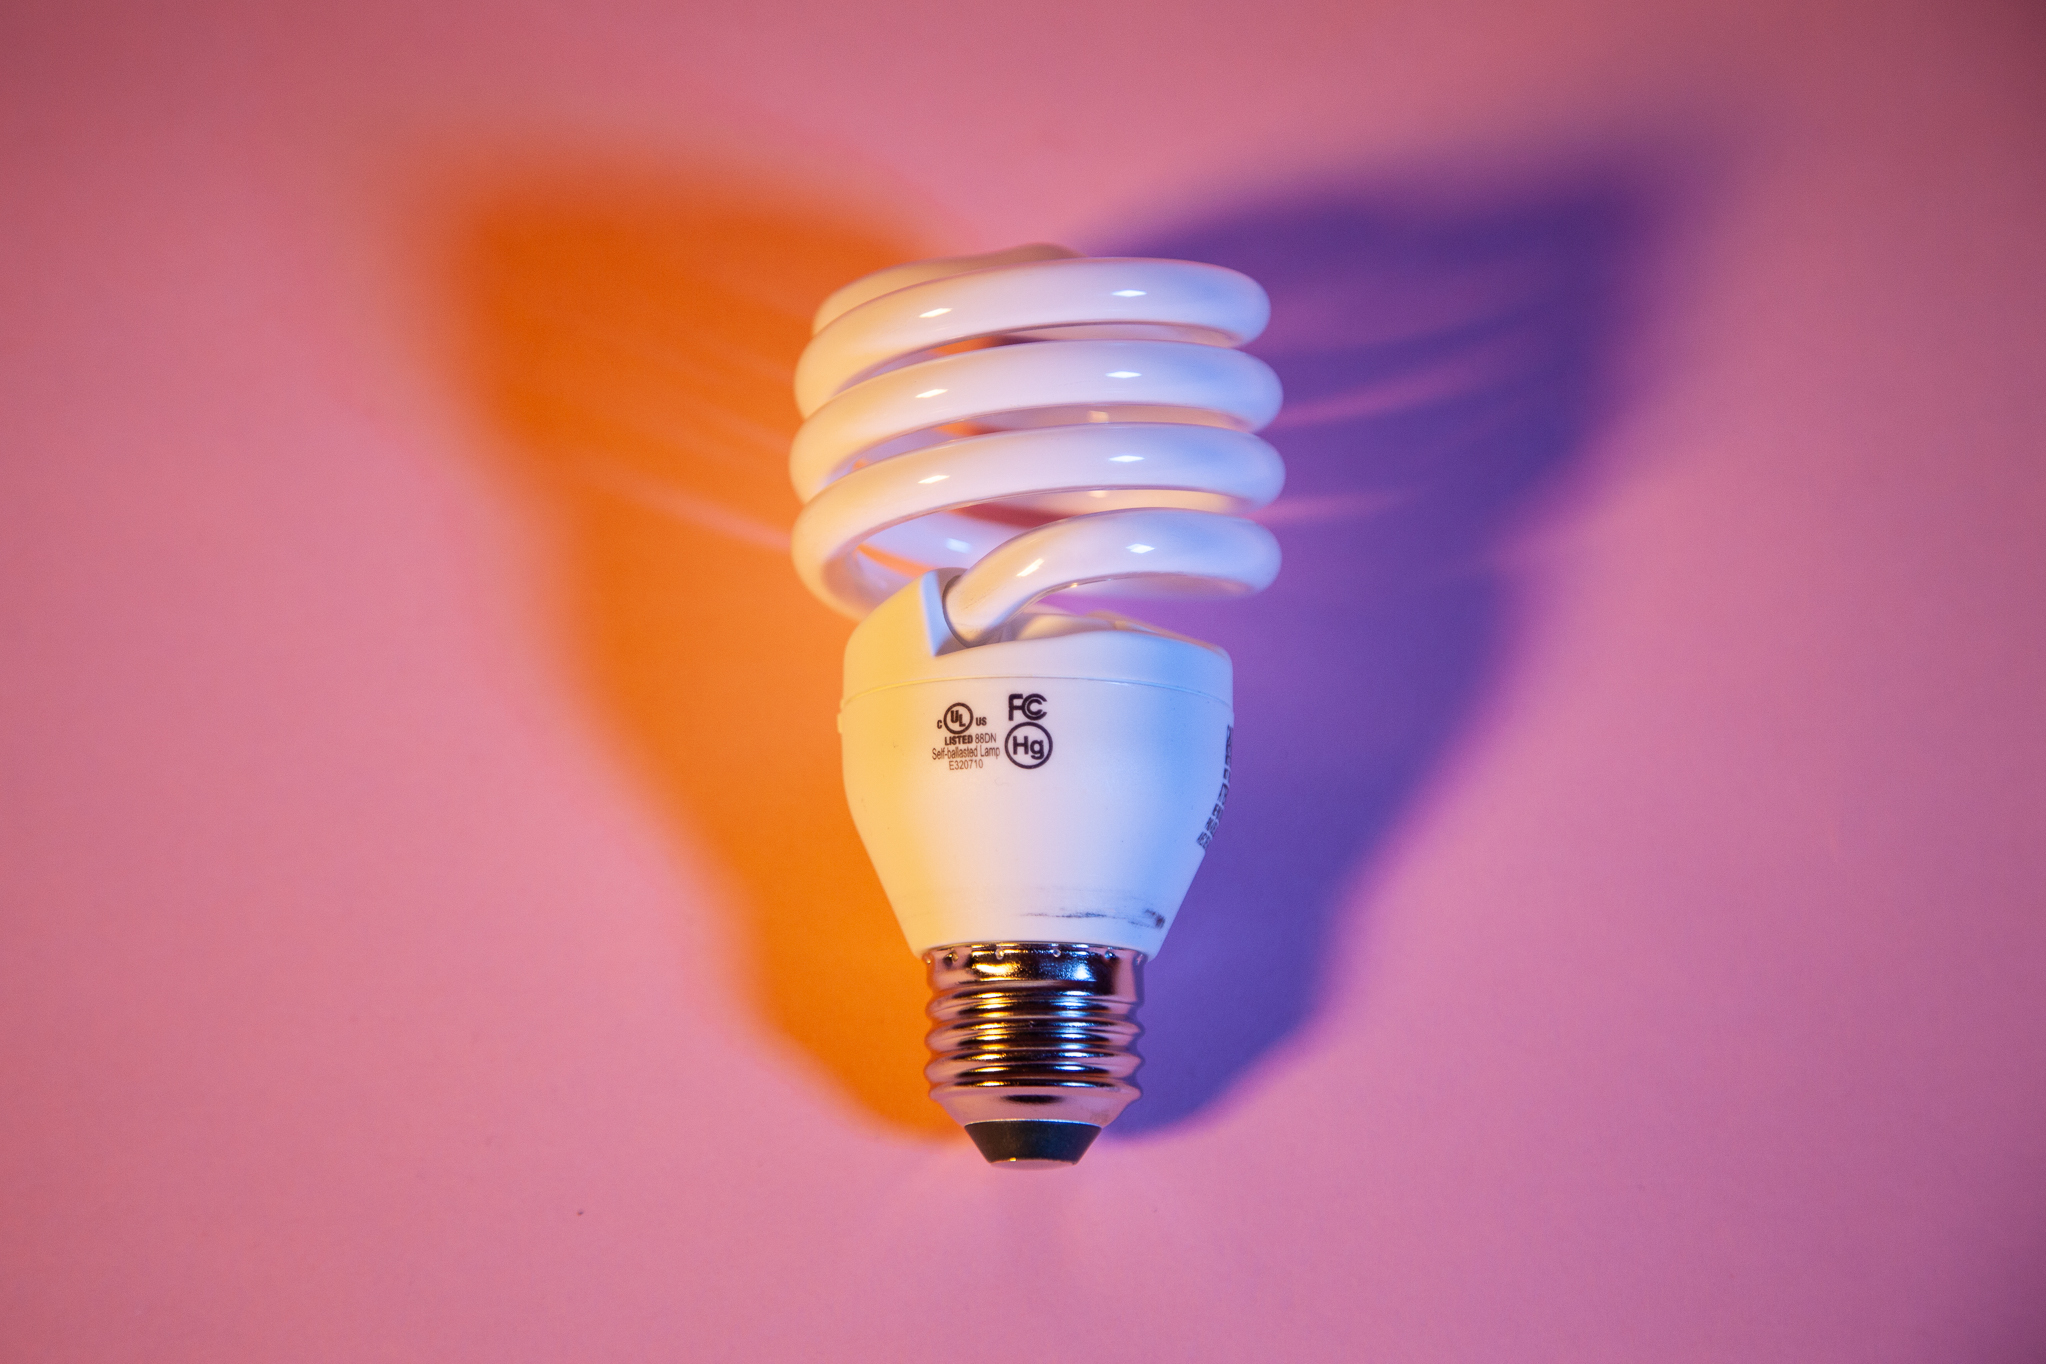 How To Choose A Lightbulb Life Kit Npr